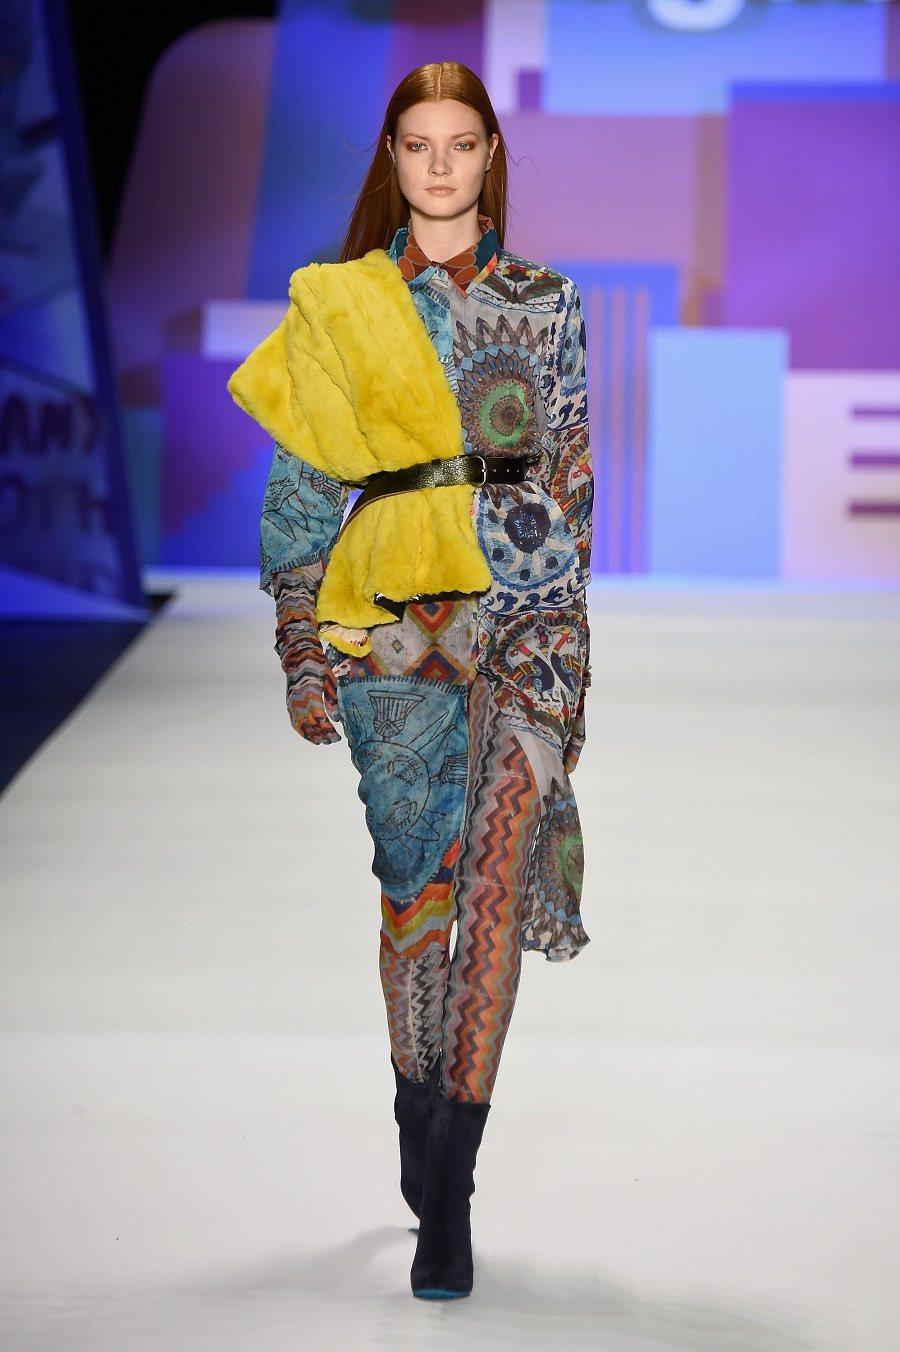 A model walks the runway wearing Desigual Fall 2016